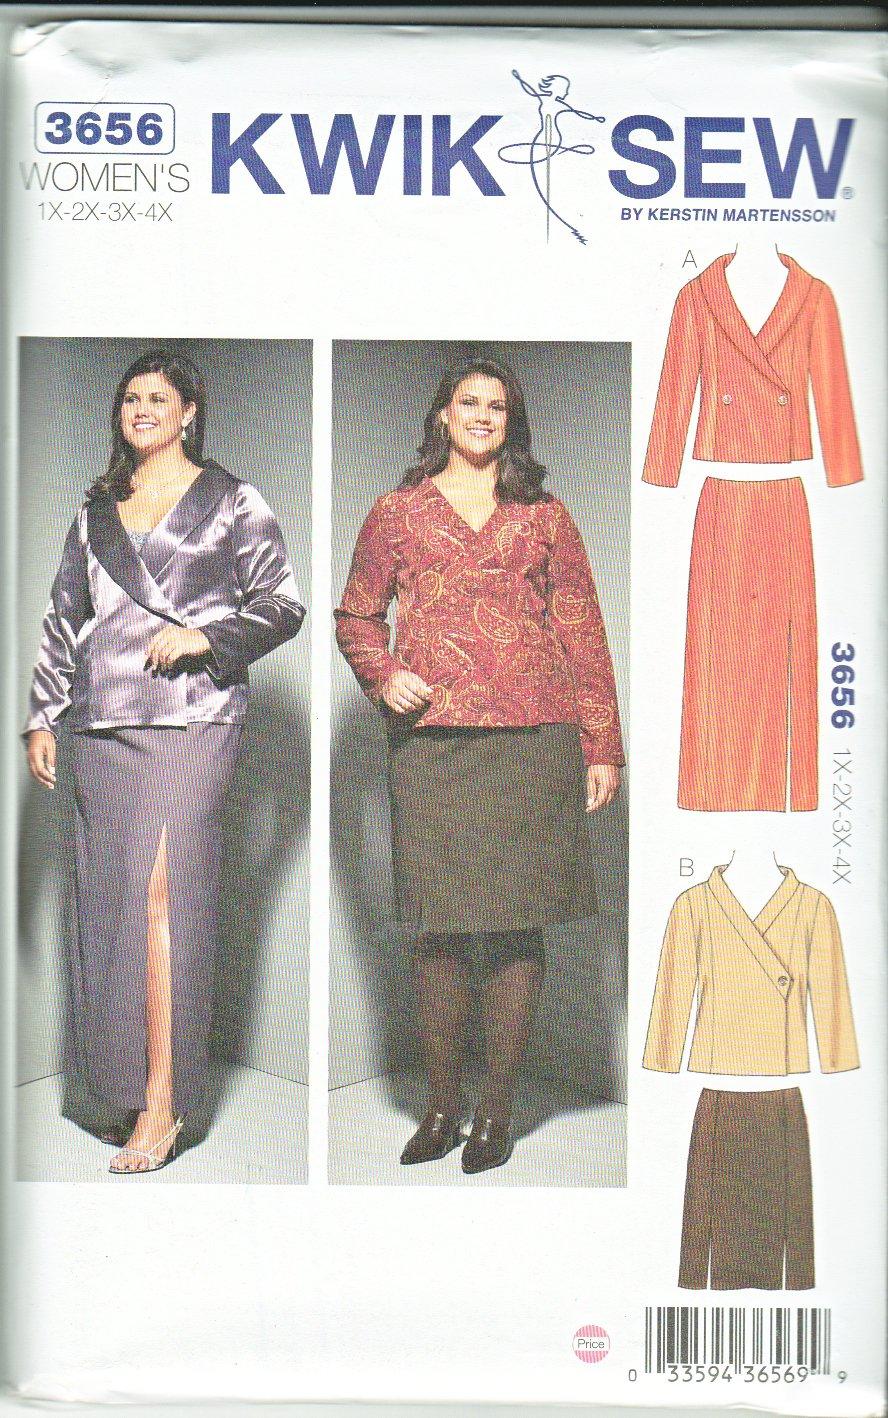 Kwik Sew Sewing Pattern 3656 Women's Plus Sizes 1X-4X Jackets Straight Skirts Length Collar Options